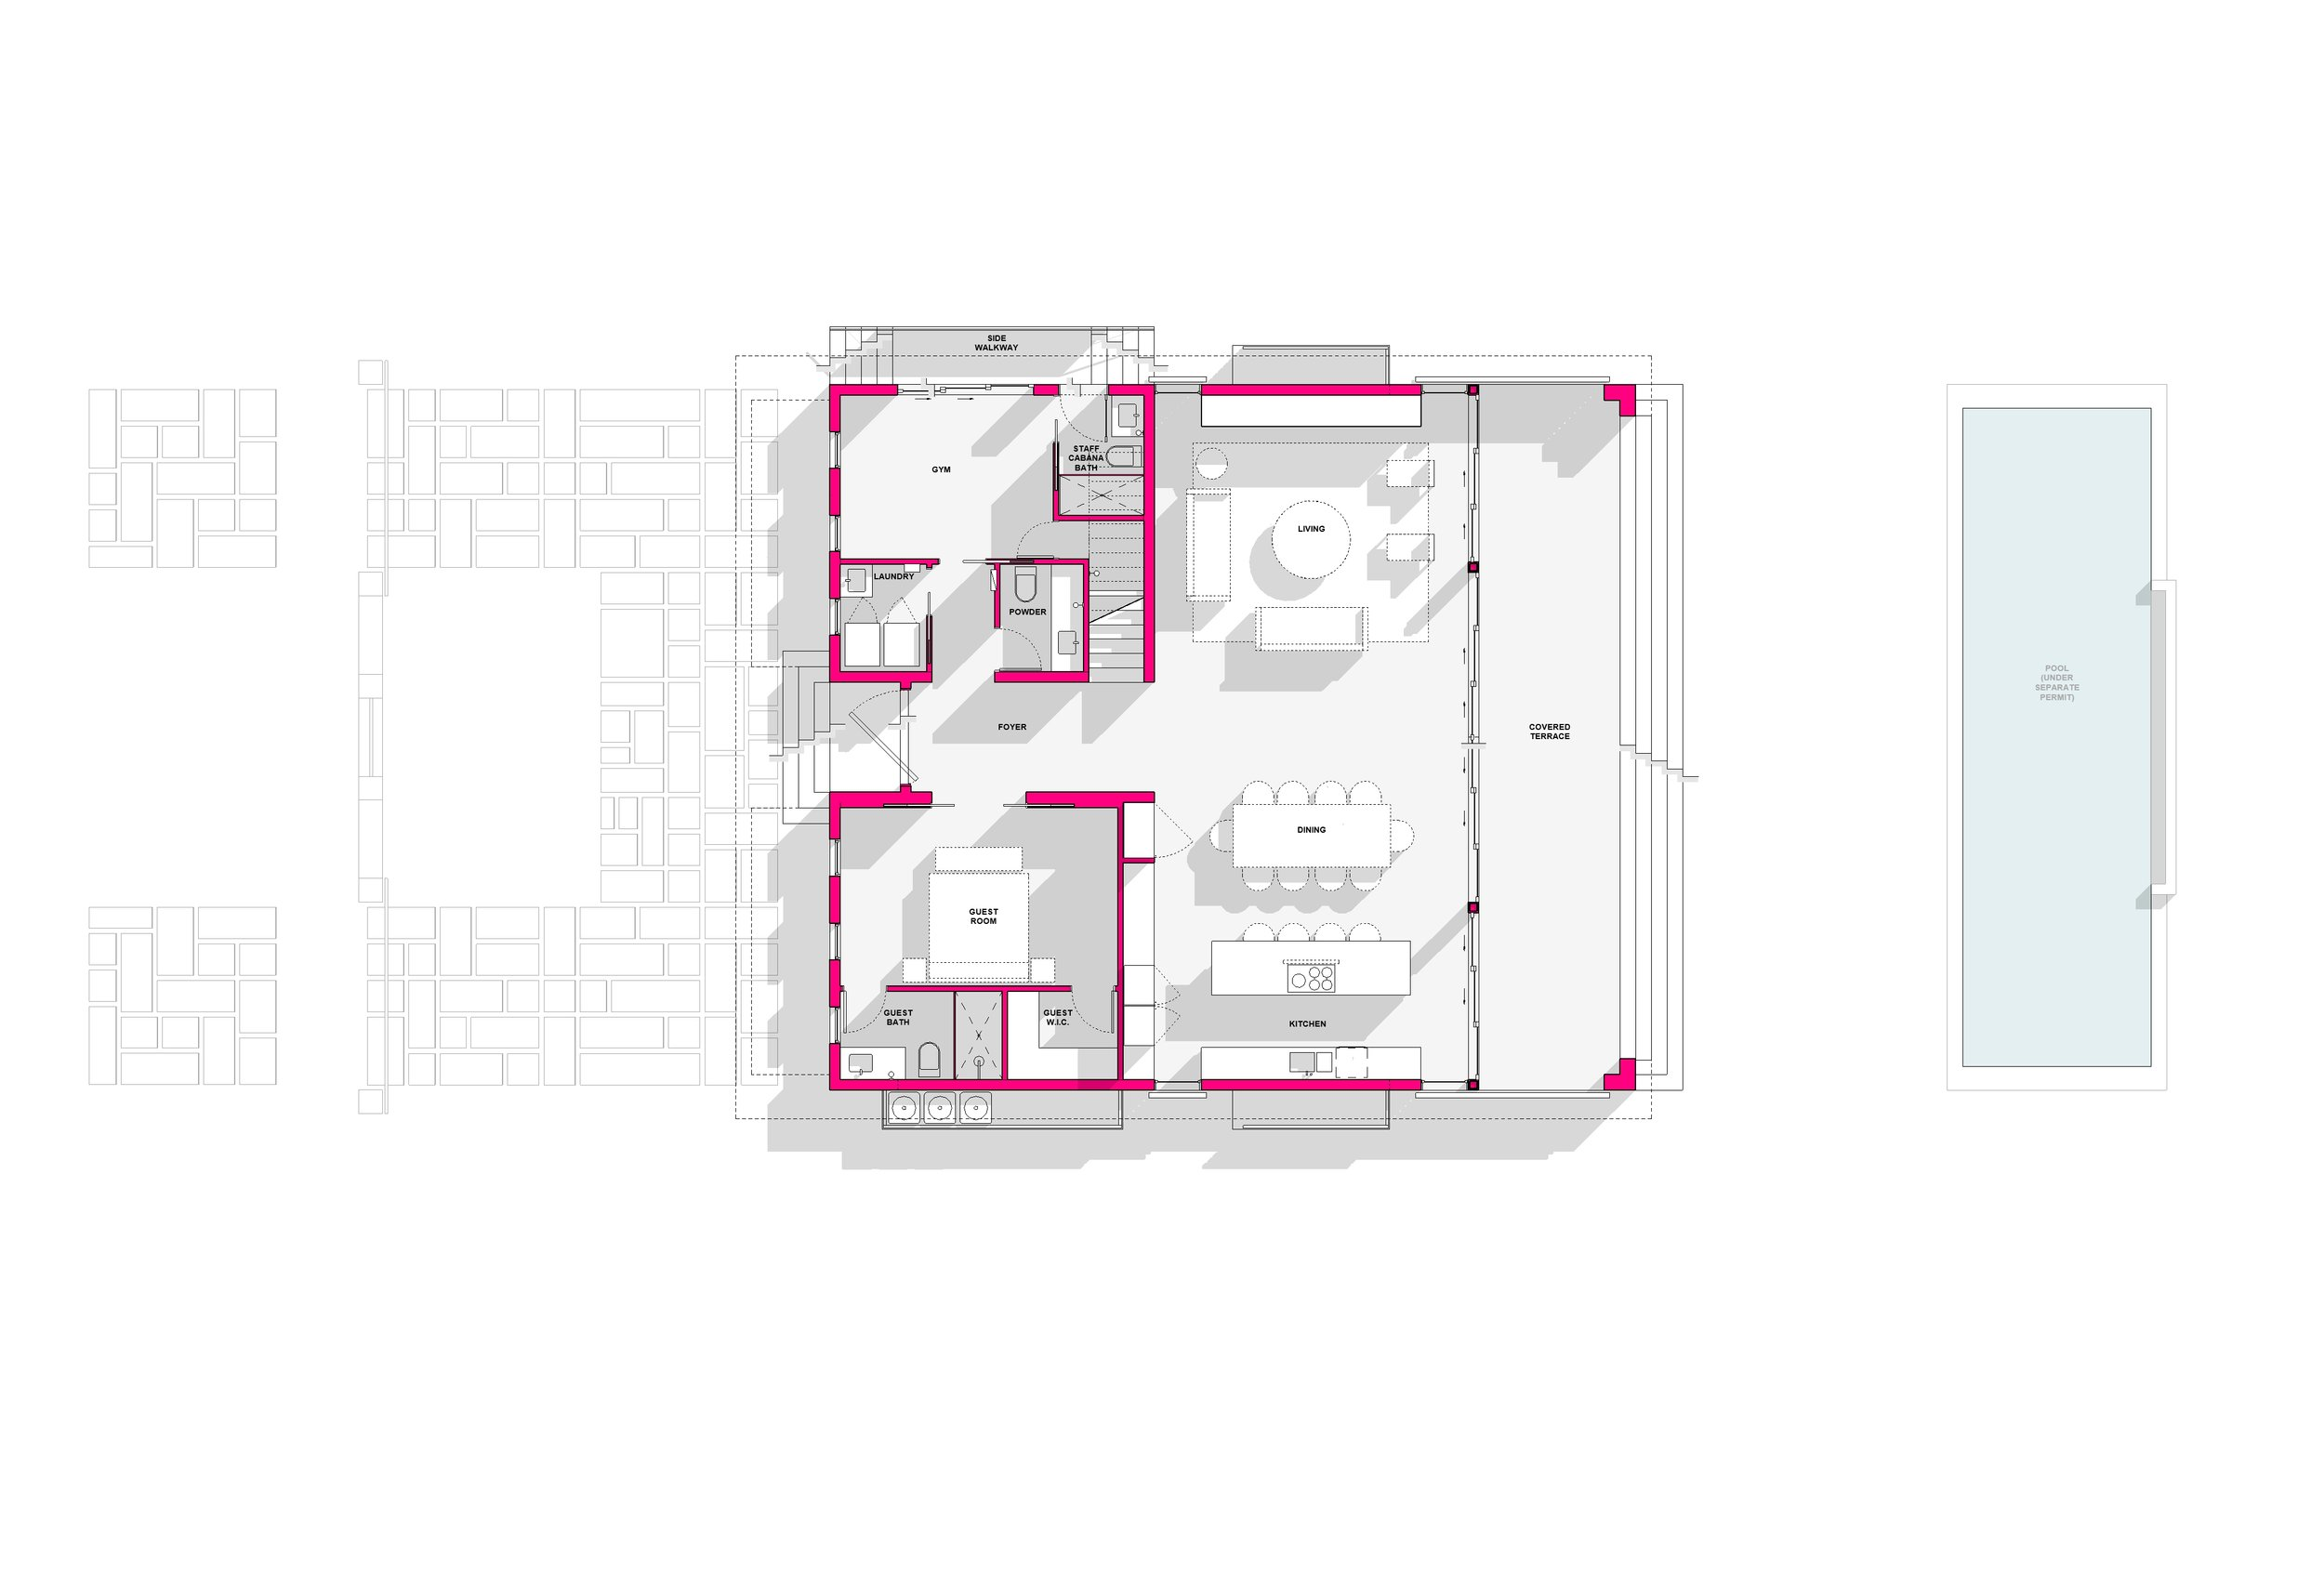 1804 BAYROAD - Sheet - X1 - First Floor Plan.jpg